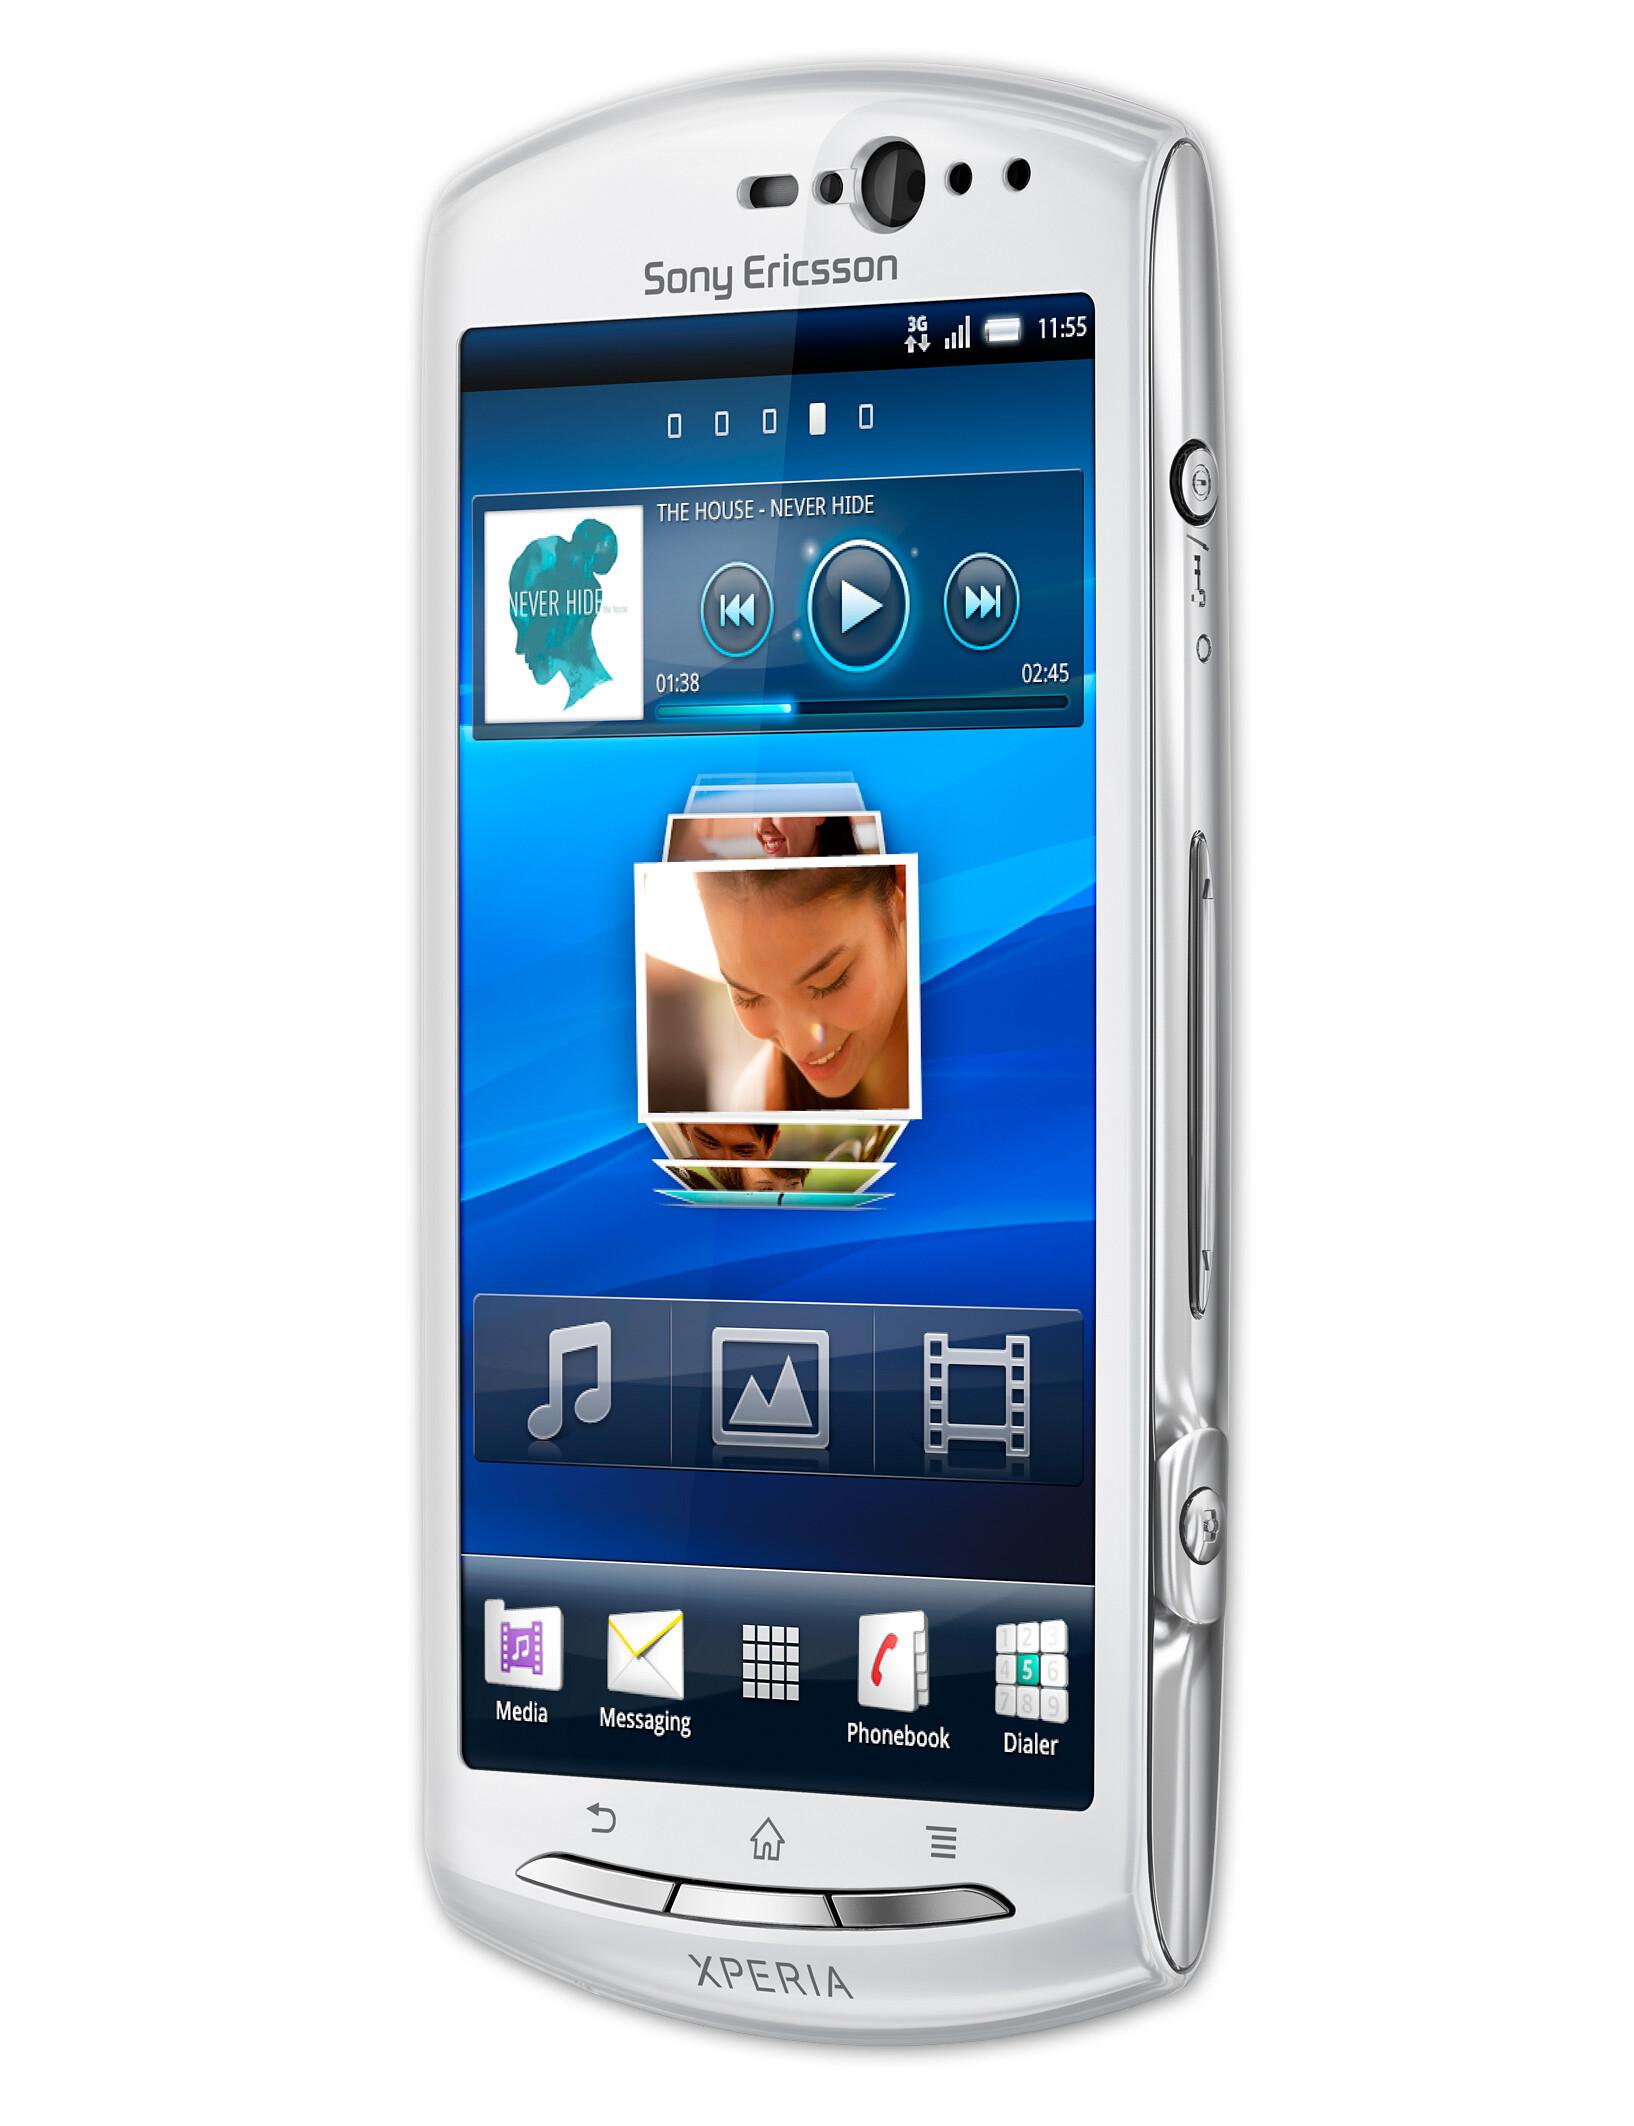 Sony Ericsson Walkman Phone Source: www.photoxels.com